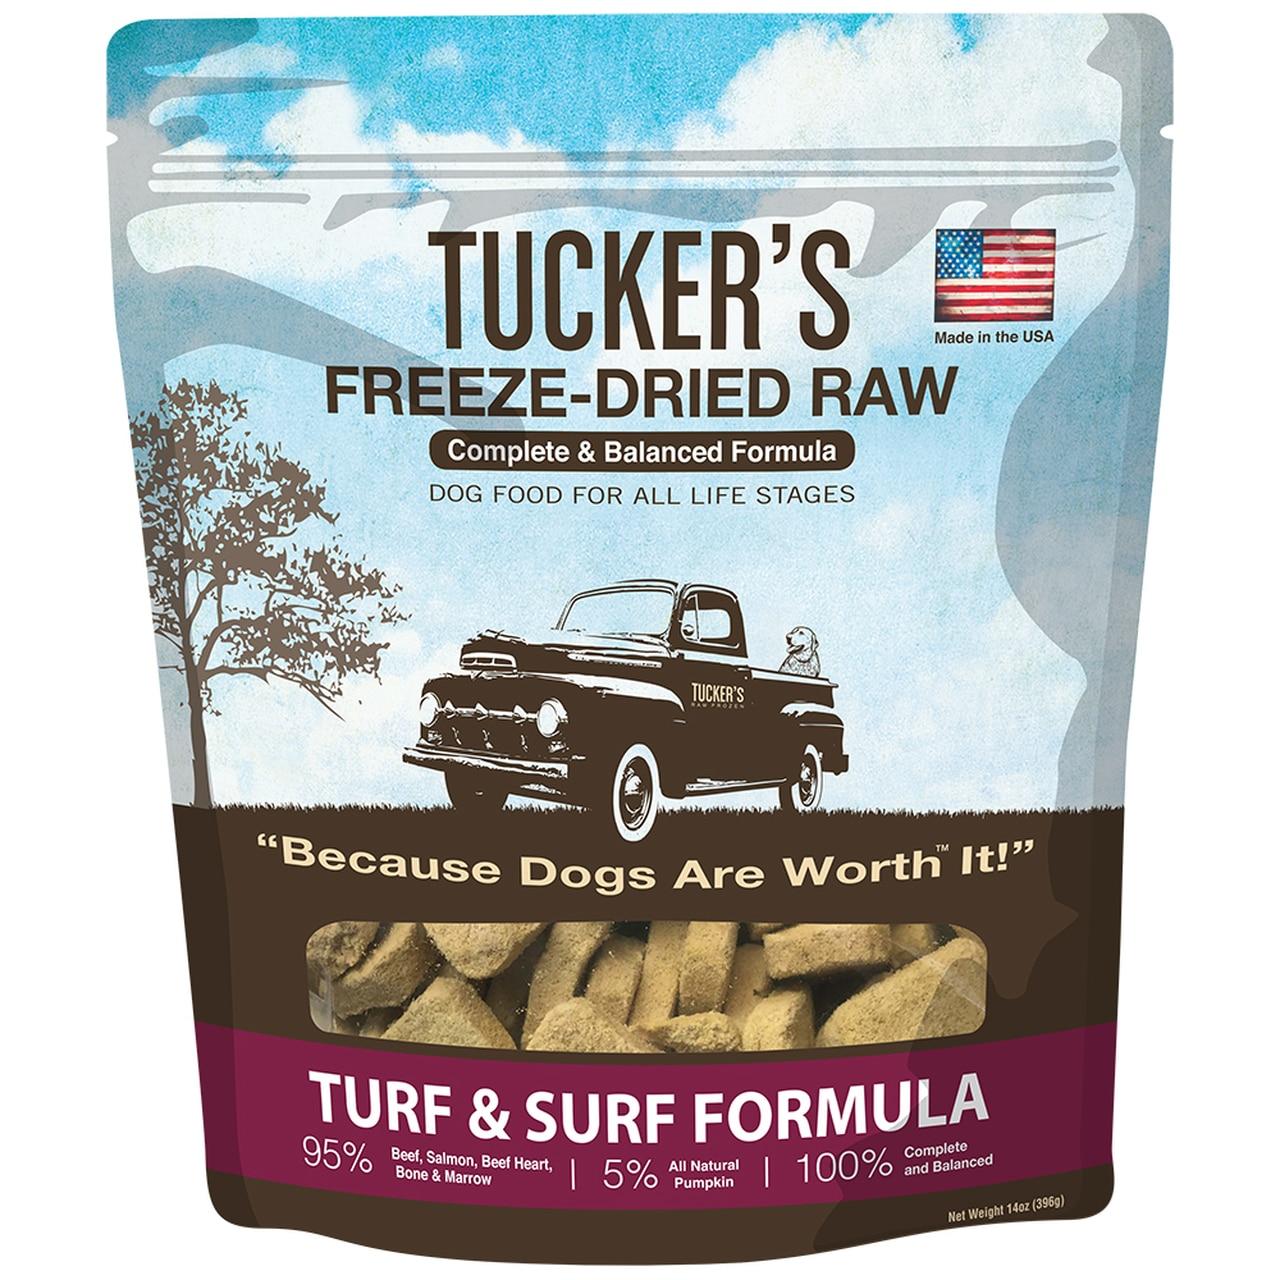 Tucker's Turf & Surf Formula Freeze-Dried Raw Dog Food, 14-oz